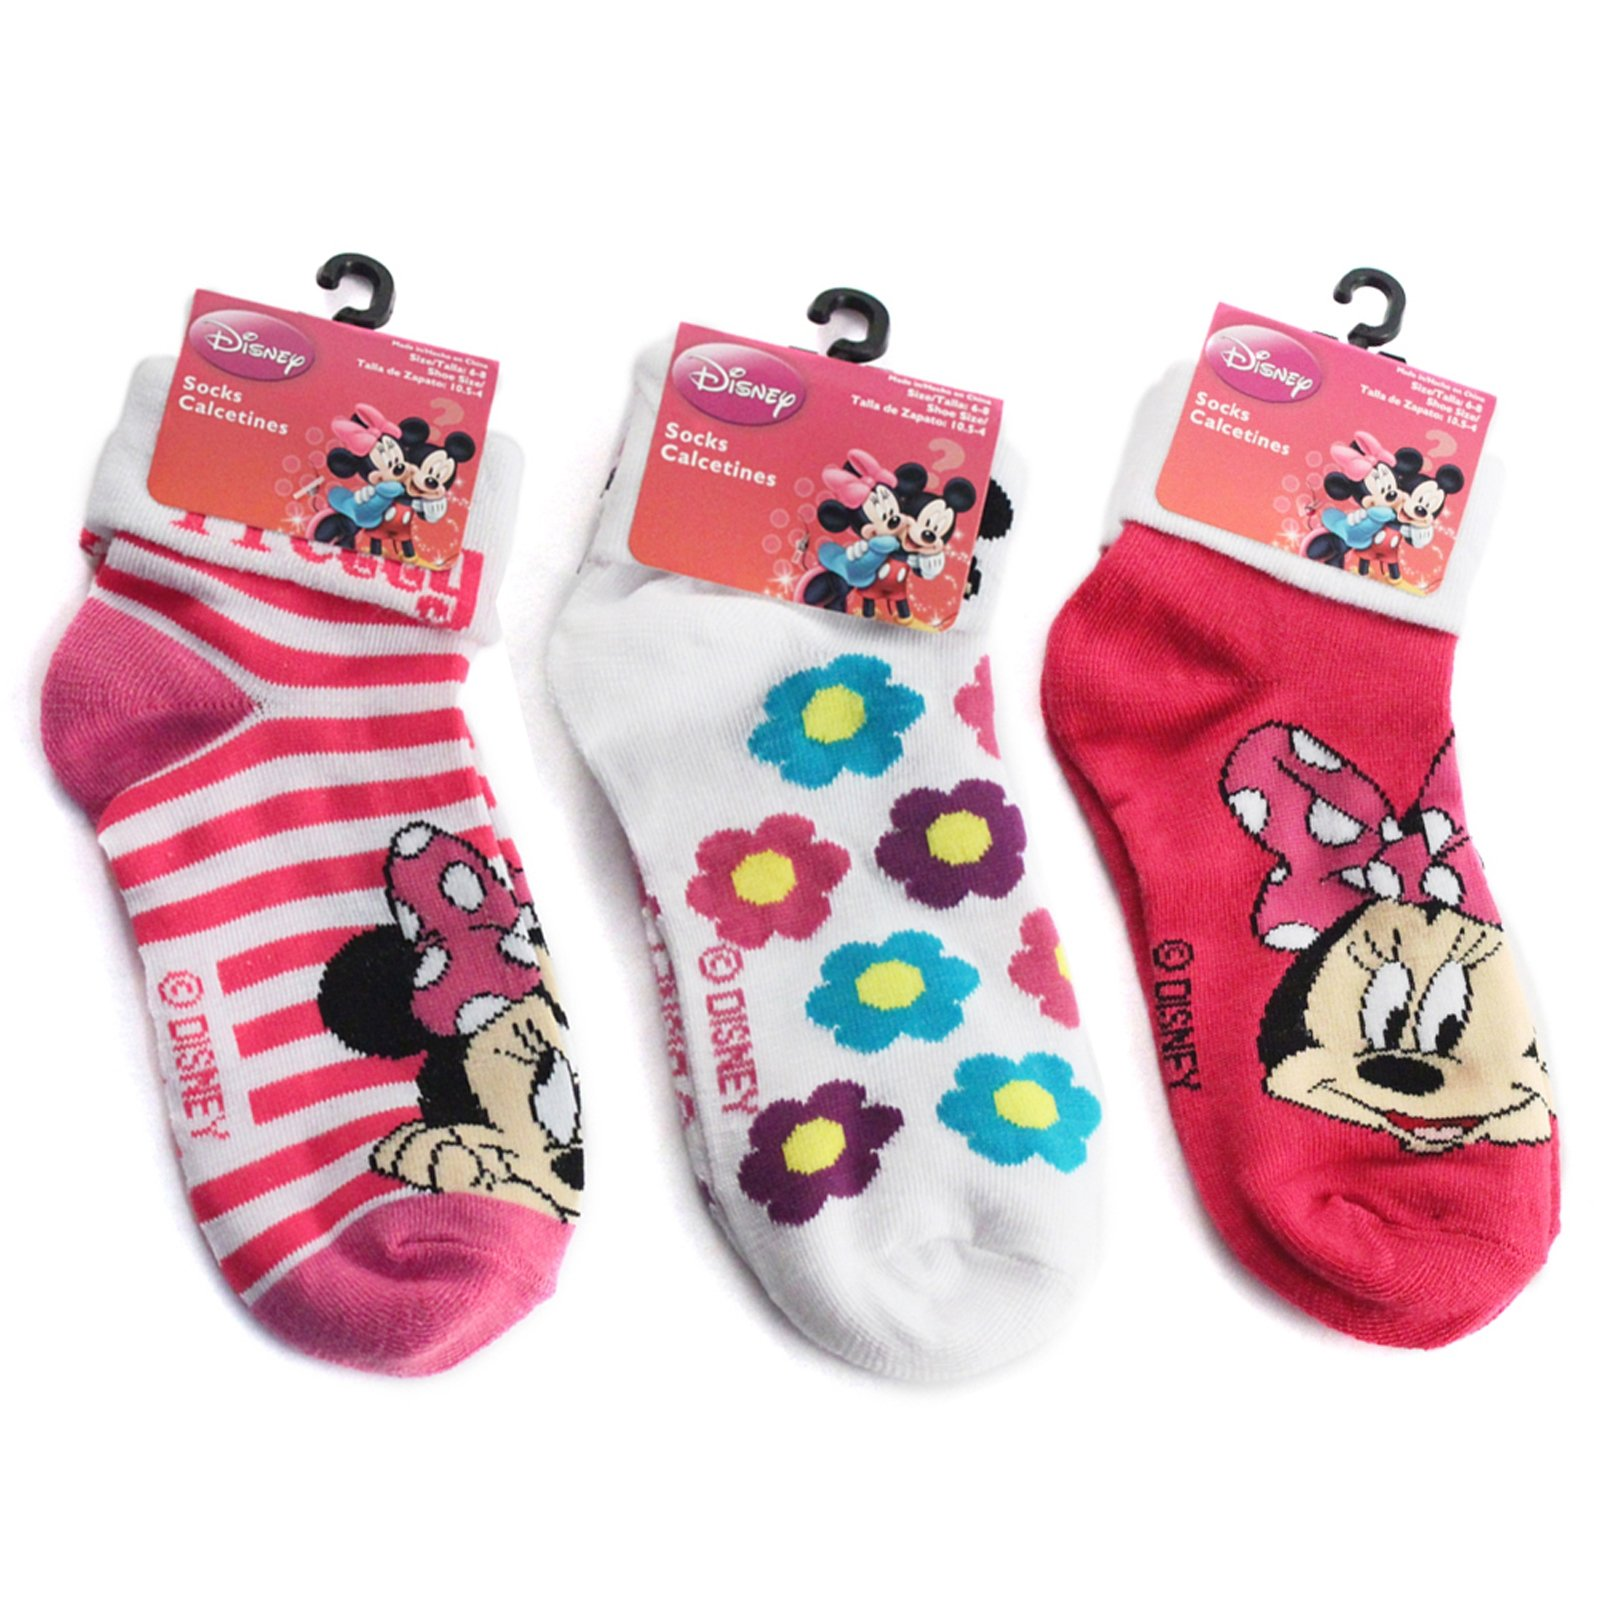 3pk Disney Minnie Mouse Stretch Turn Cuff Ankle Socks Size 6-8